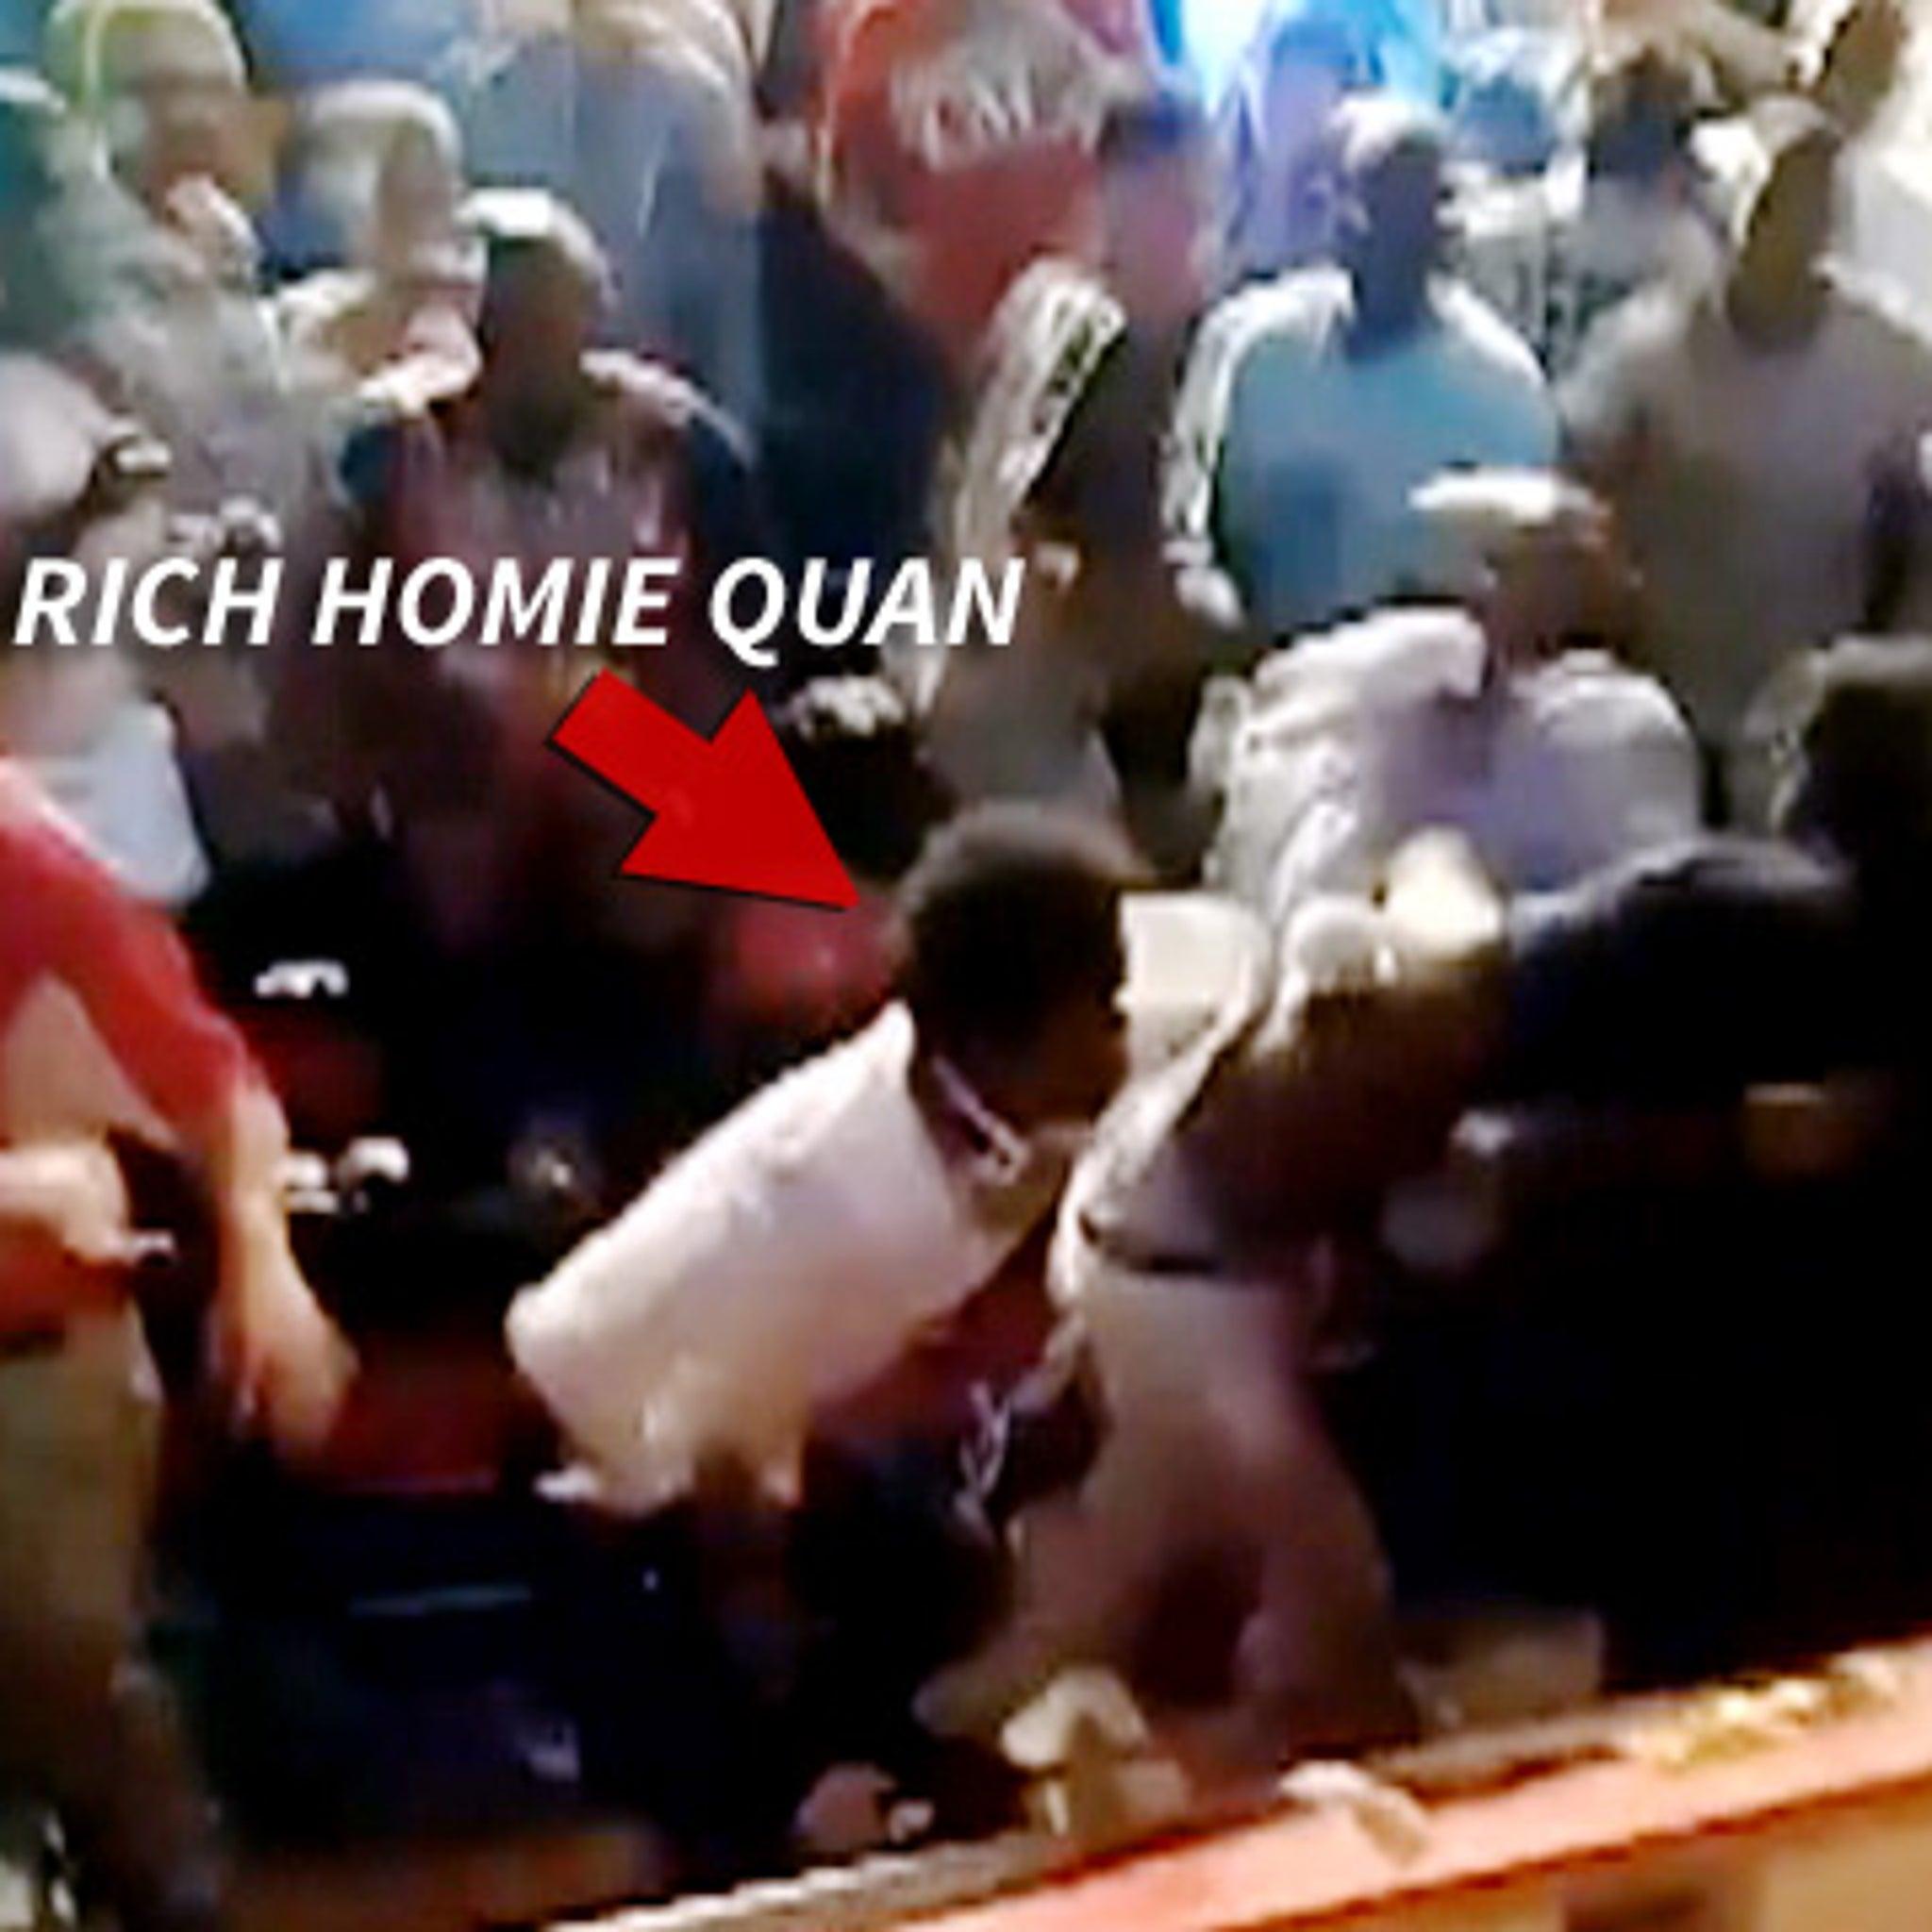 Rapper Rich Homie Quan -- Boxing Match Brawl IN THE CROWD!